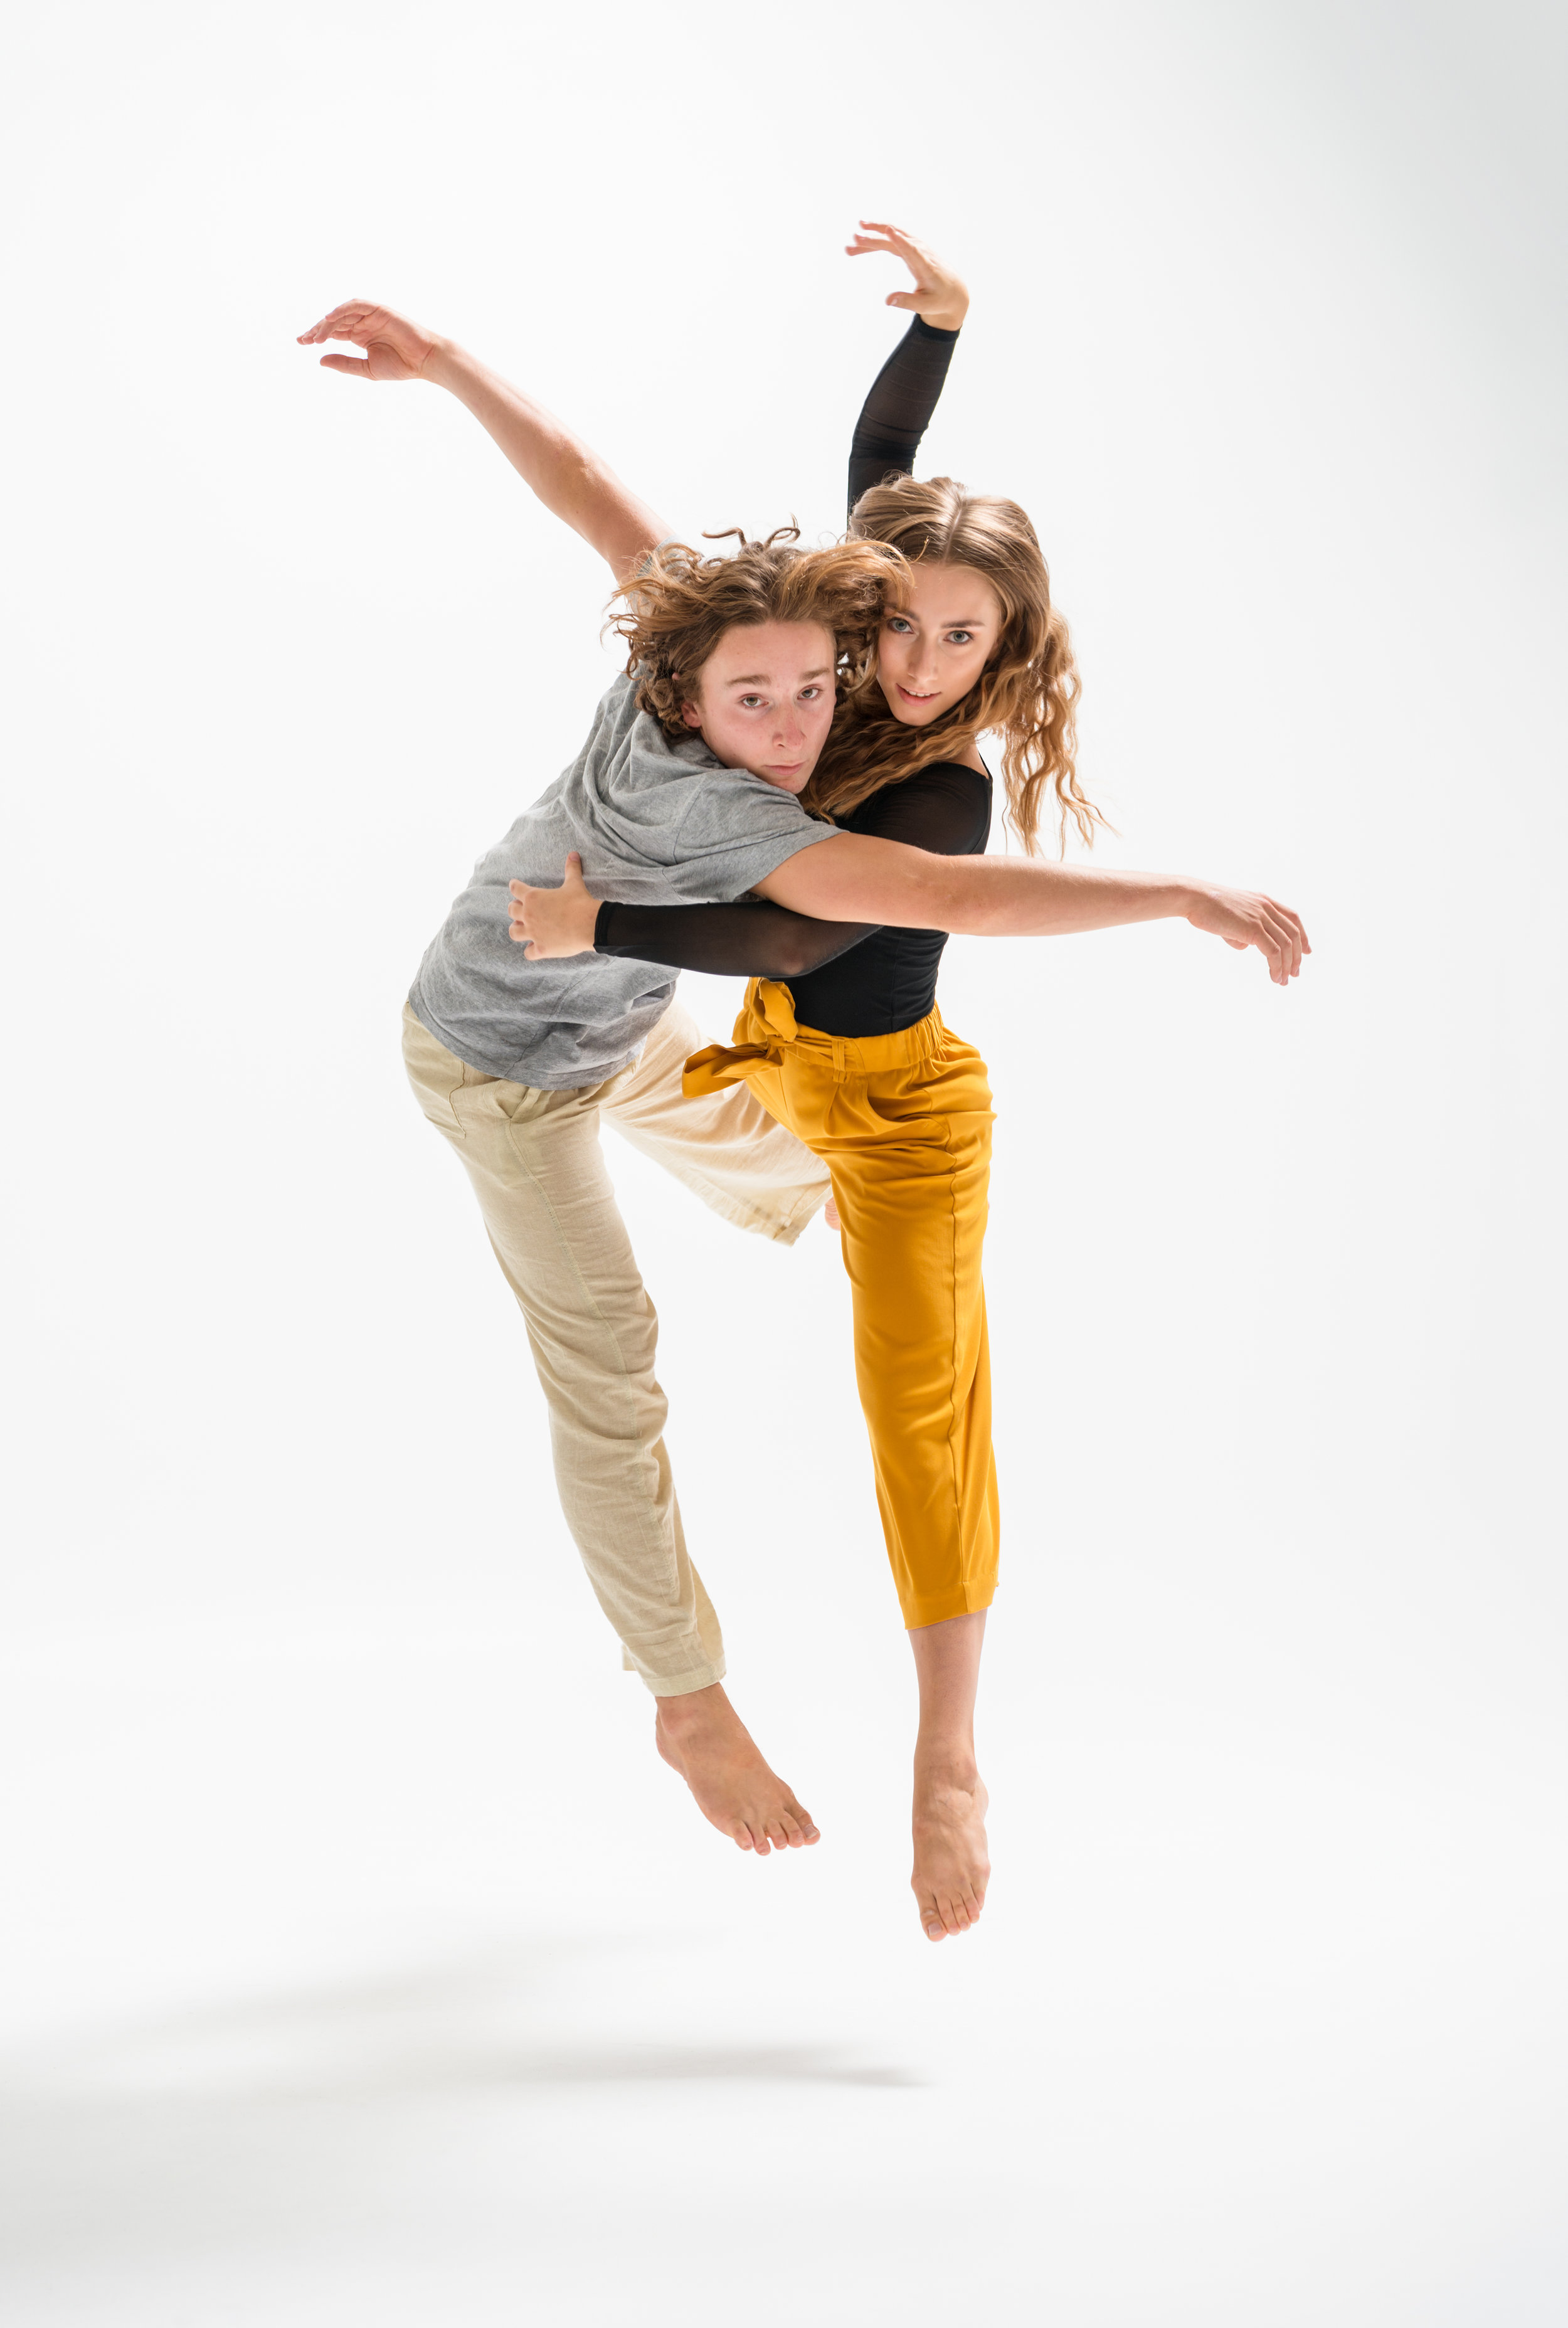 Sebastian Geilings and Olivia Foley photo by Stephen A 'Court